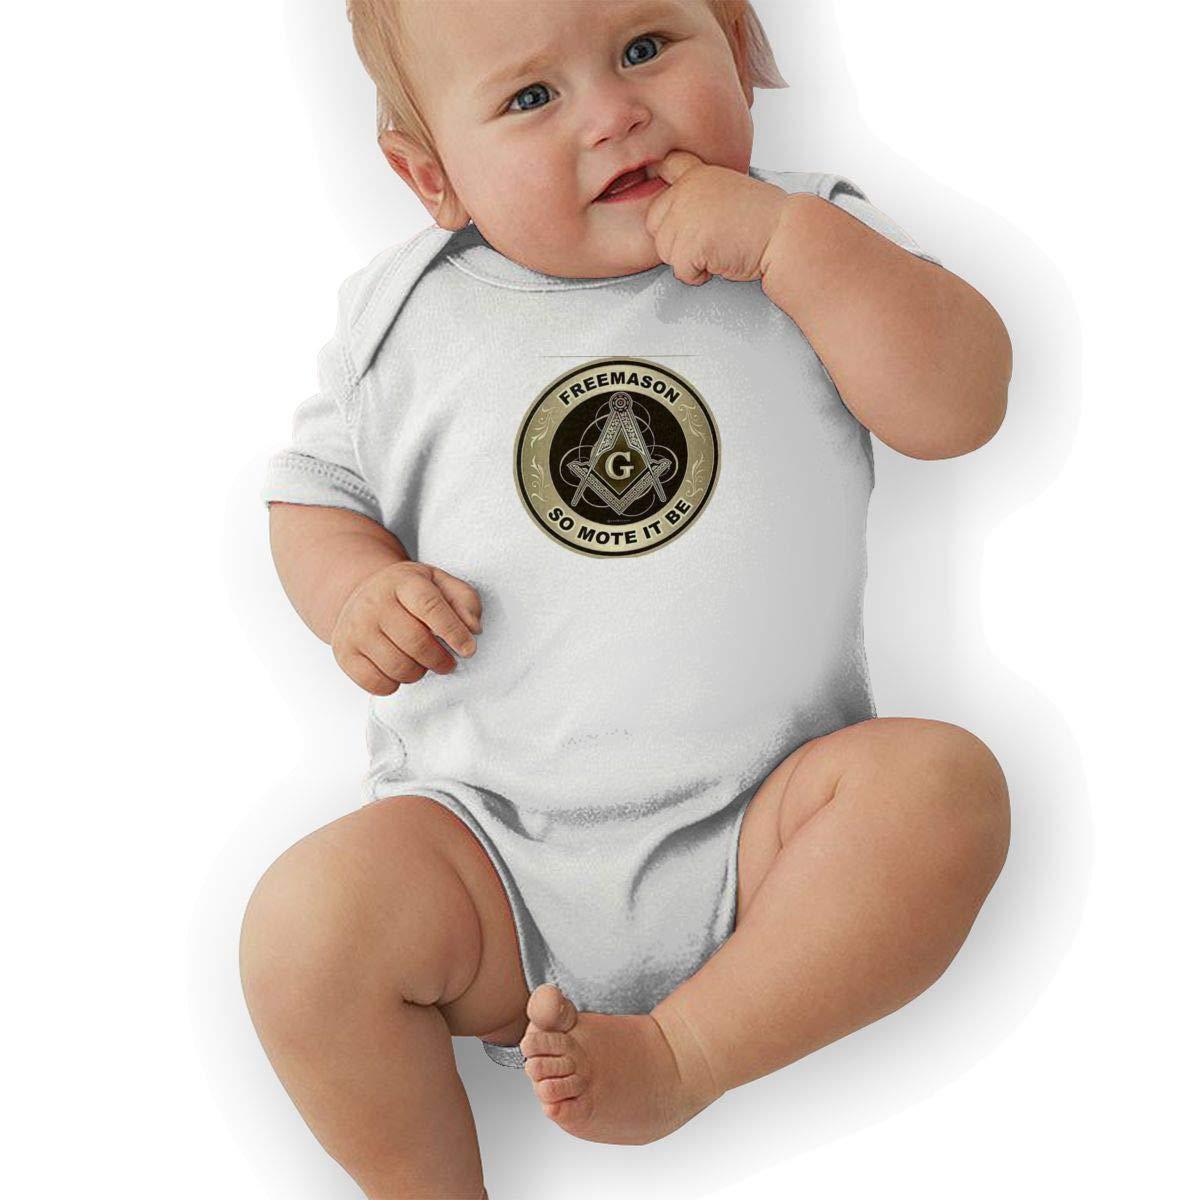 HappyLifea Freemason So Mote It Be Newborn Baby Short Sleeve Romper Infant Summer Clothing